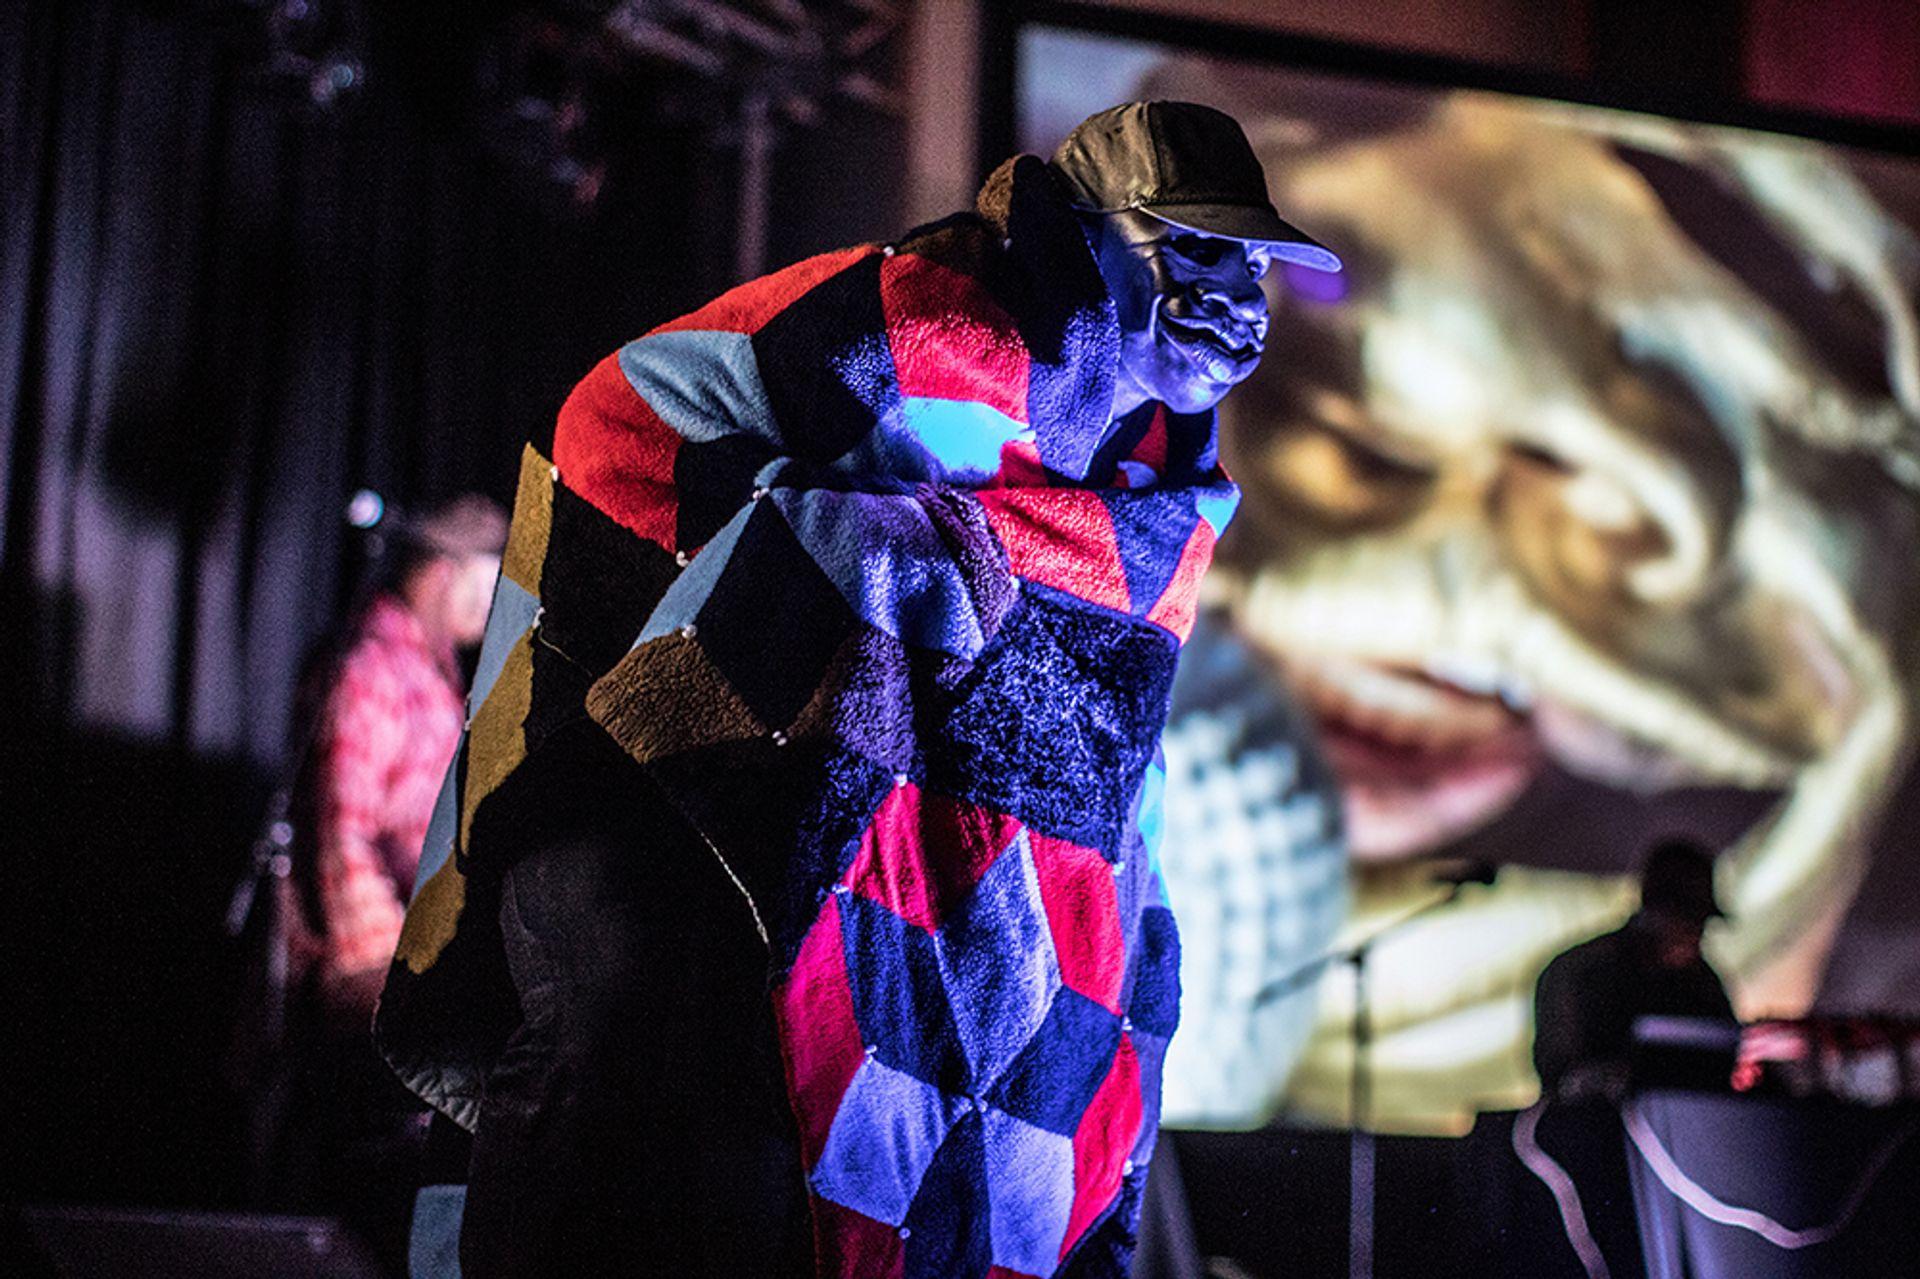 Moon Medicin's performance Un-Televised Revolutions